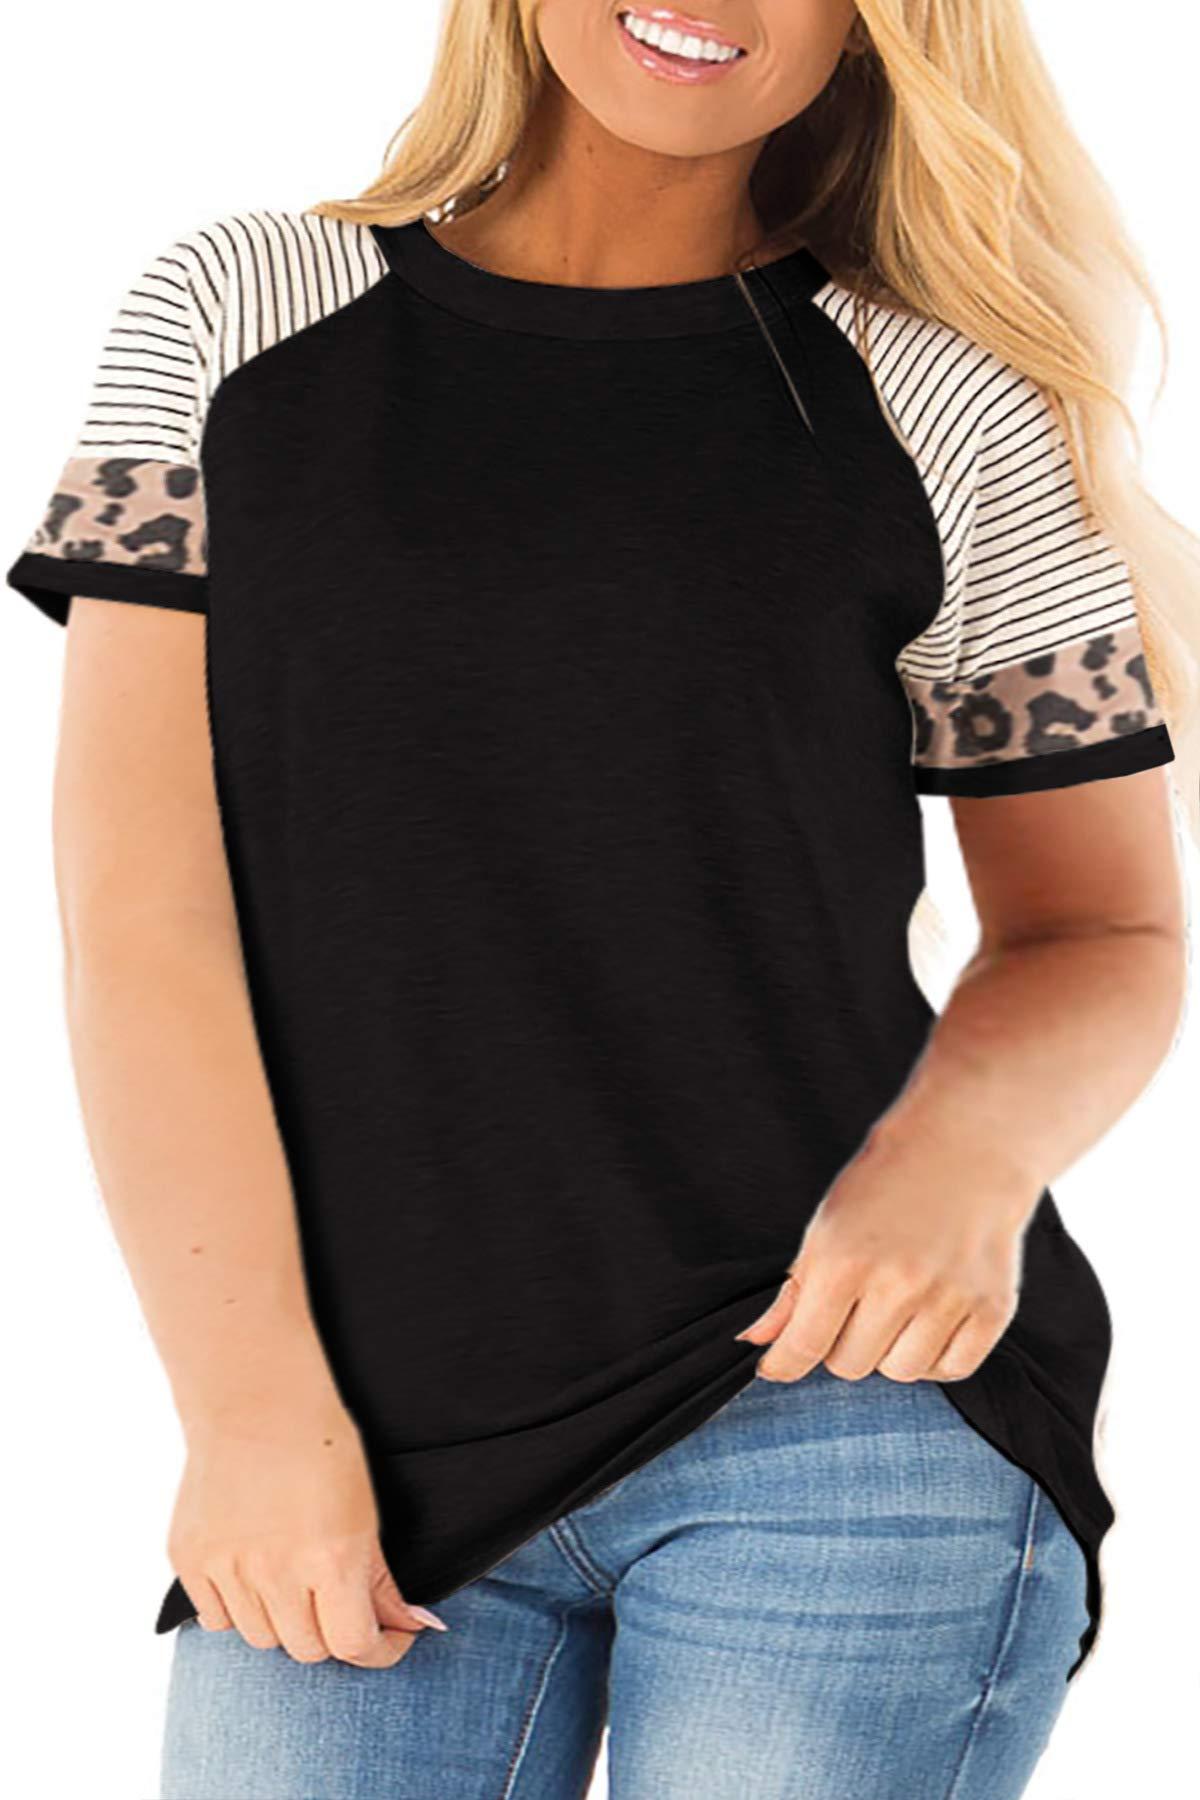 LANREMON Womens Plus Size Leopard Tunic Tops Loose Crewneck Striped Tunic Short Sleeve Color Block T Shirt Blouse